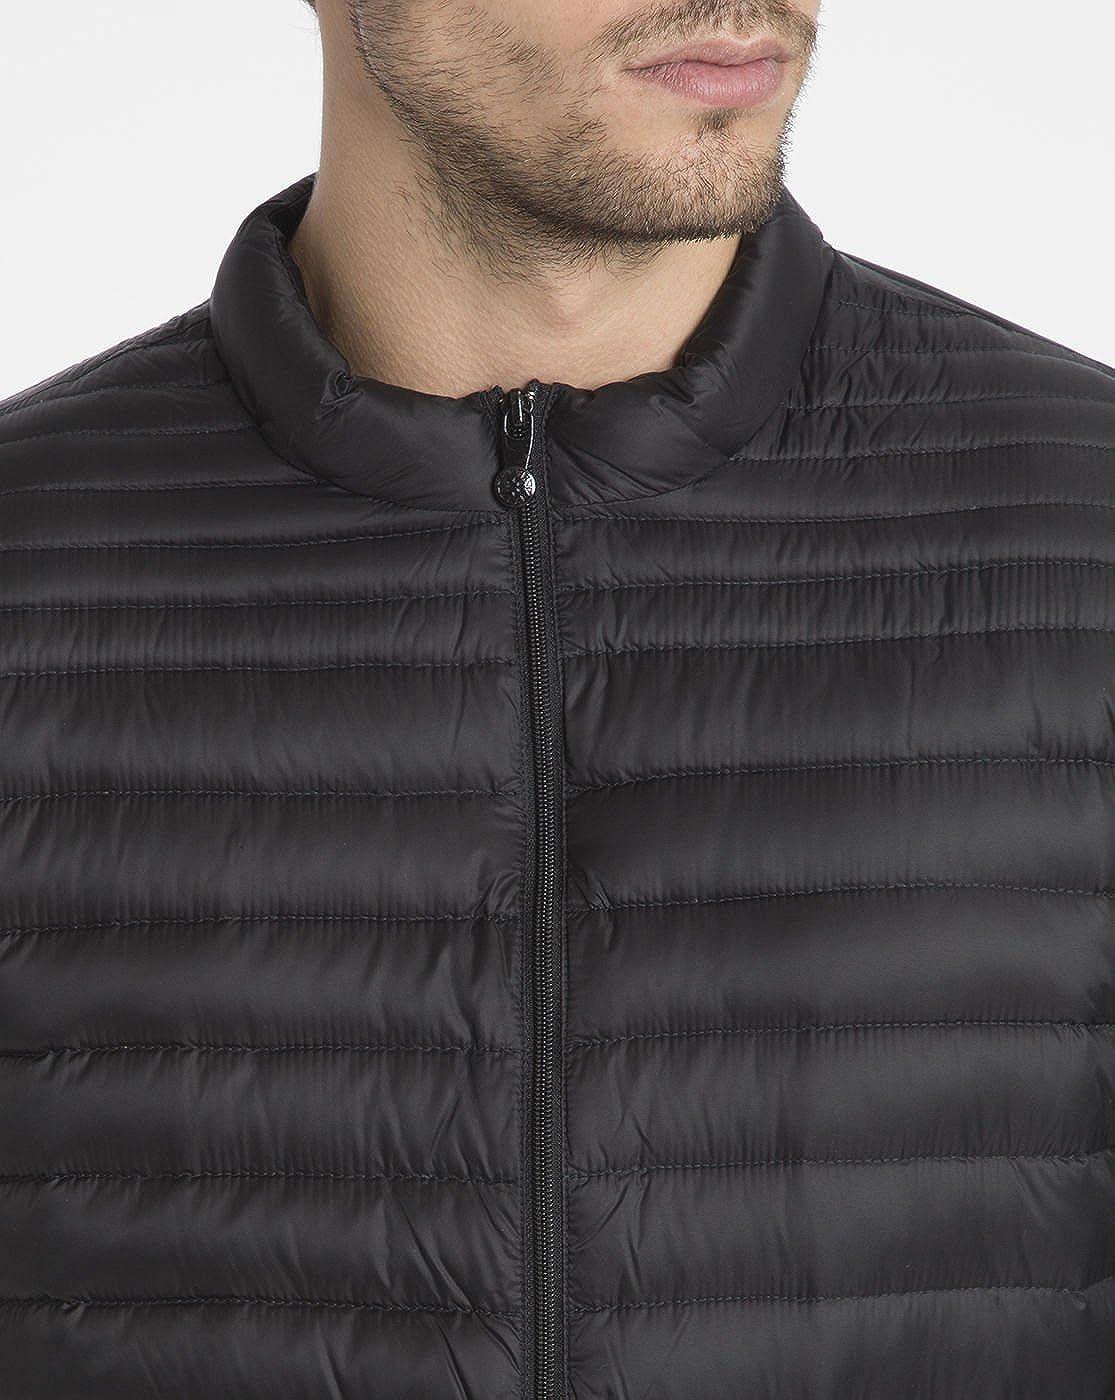 bce947df6 Pyrenex Men's Mateo Lightweight Quilted Jacket - Black - L: Amazon.co.uk:  Clothing